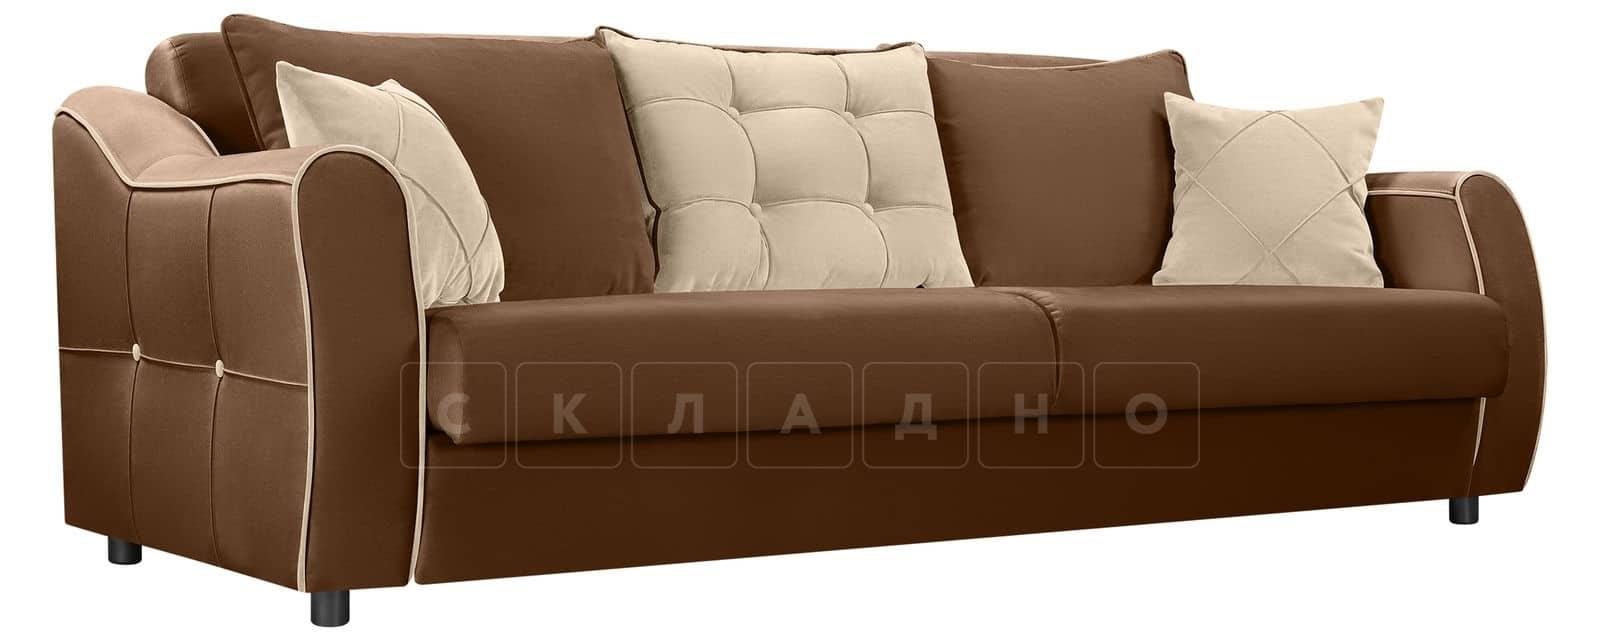 Диван Флэтфорд велюр коричневый фото 1 | интернет-магазин Складно